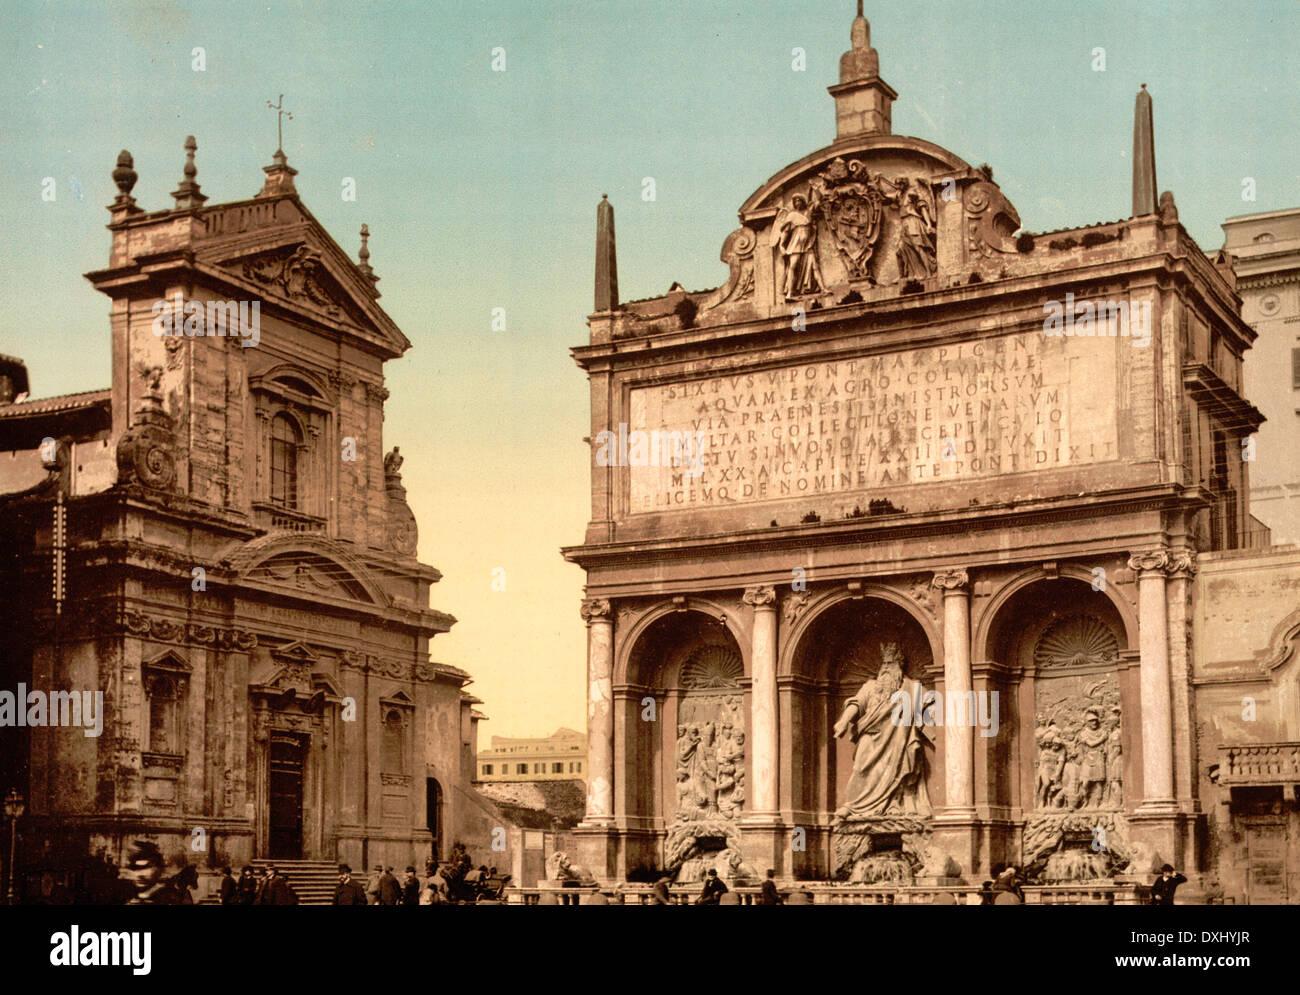 Fountain 'Acqua Felice', Rome, Italy, circa 1900 - Stock Image